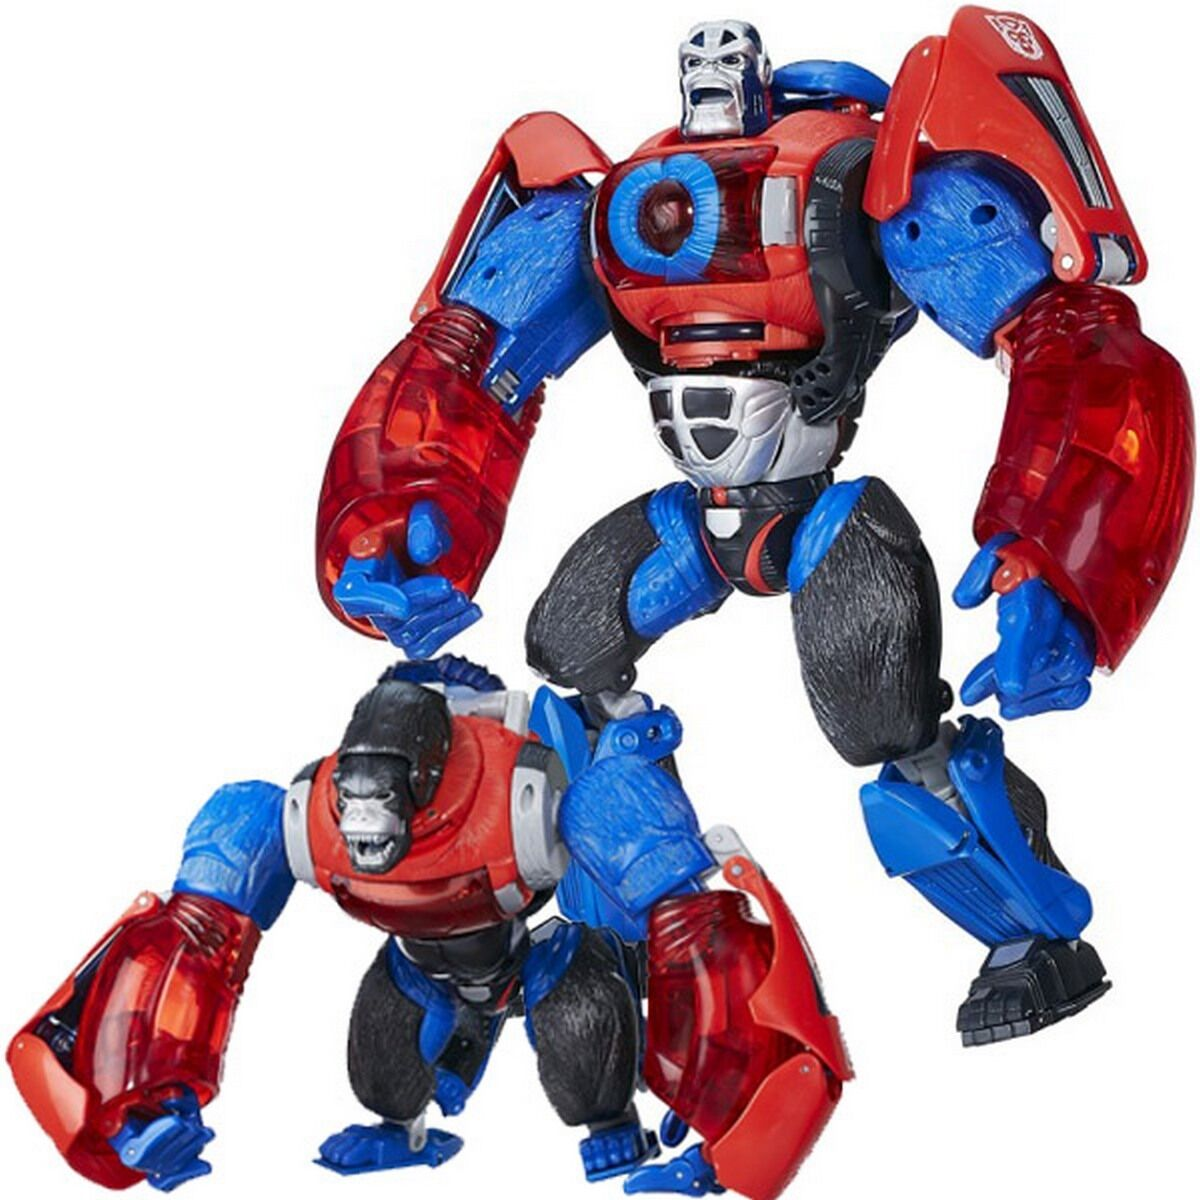 Garantía 100% de ajuste Transformers Platinum Platinum Platinum Edition OPTIMUS PRIME año del mono 2016 Nuevo  ganancia cero